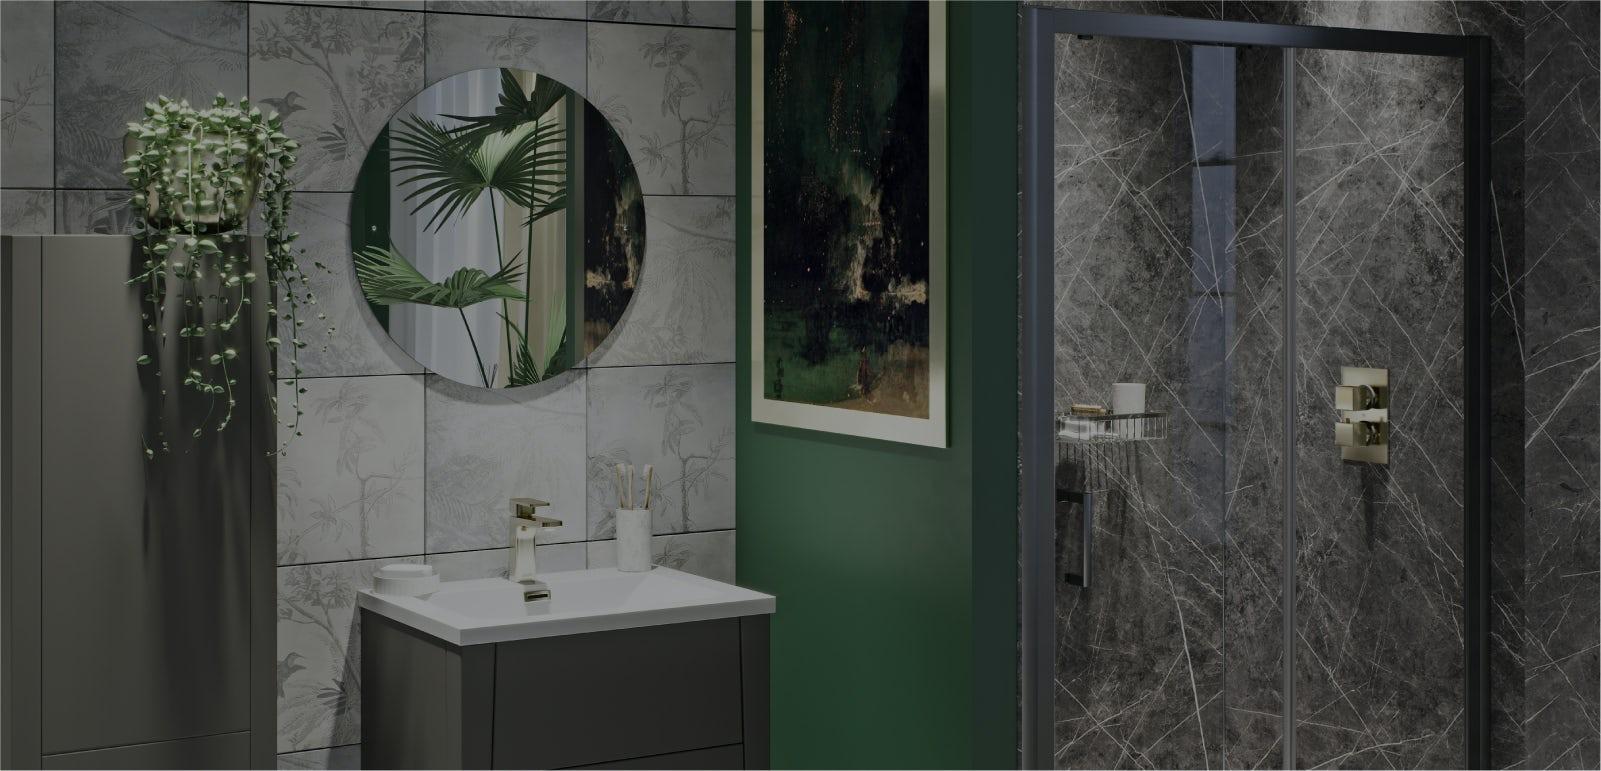 Bathroom Ideas: Manhattan part 3